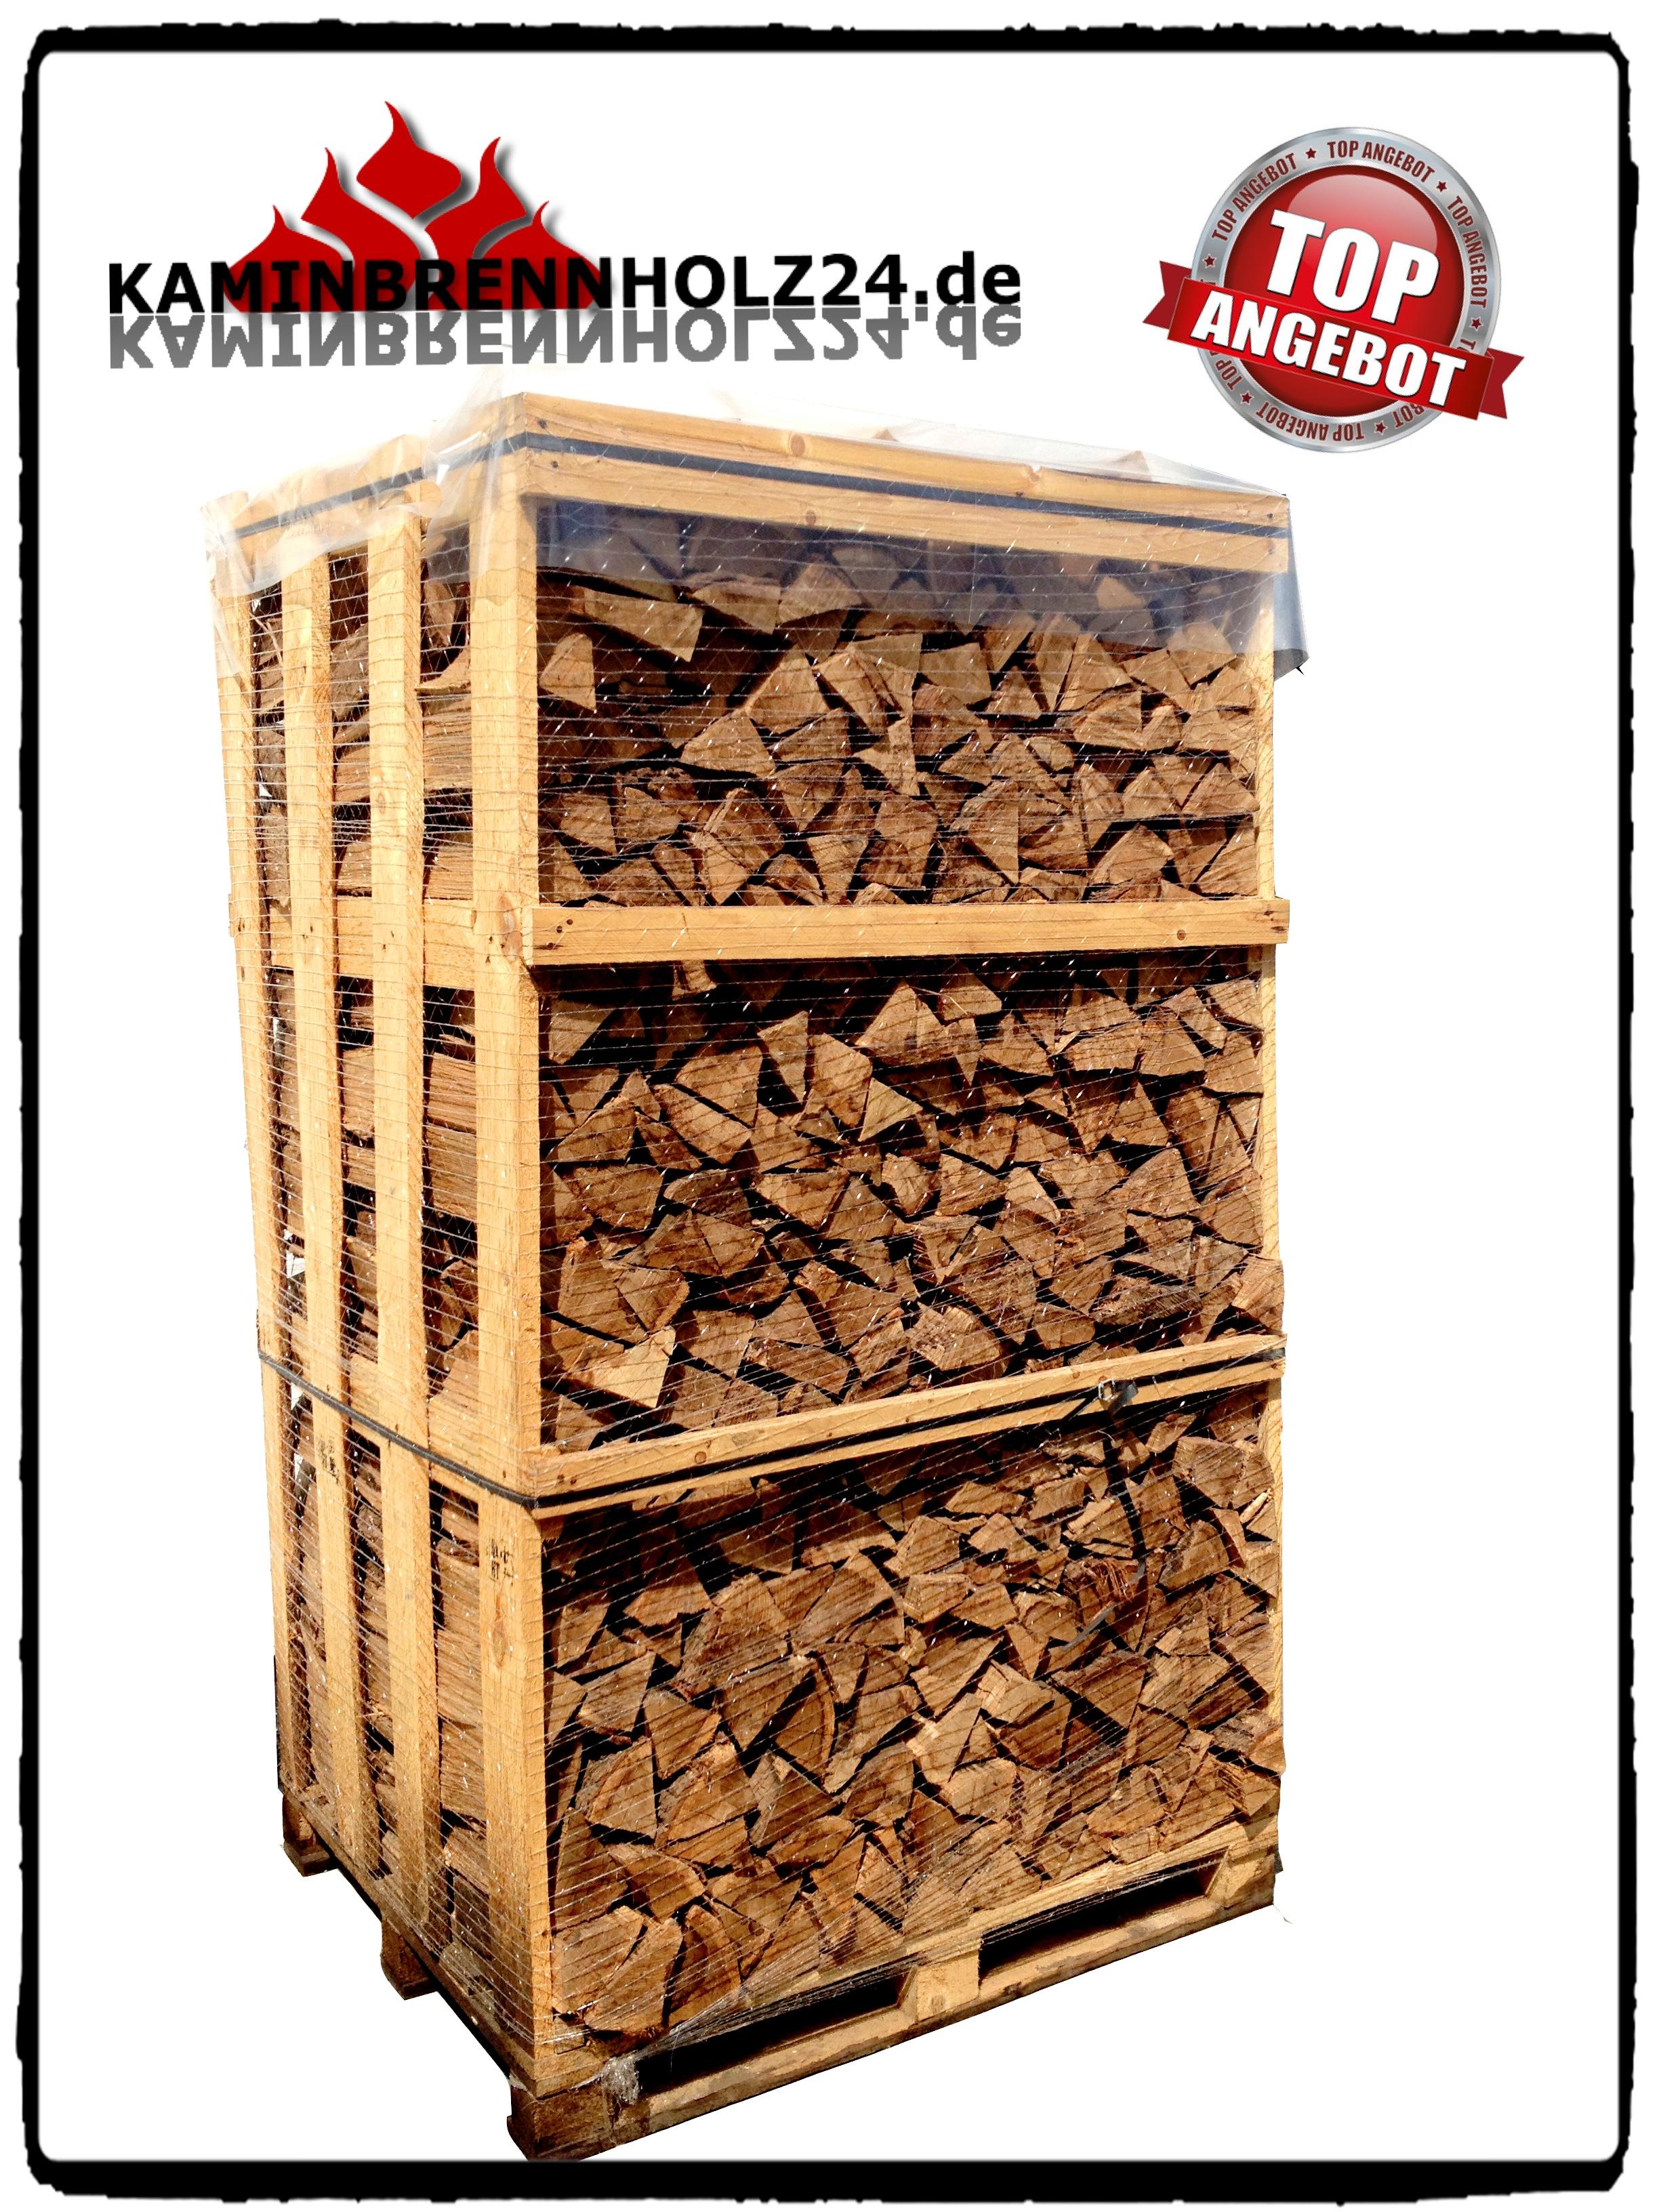 kaminholz brennholz buche kammergetrocknet g nstige regionale lieferung m glich ebay. Black Bedroom Furniture Sets. Home Design Ideas